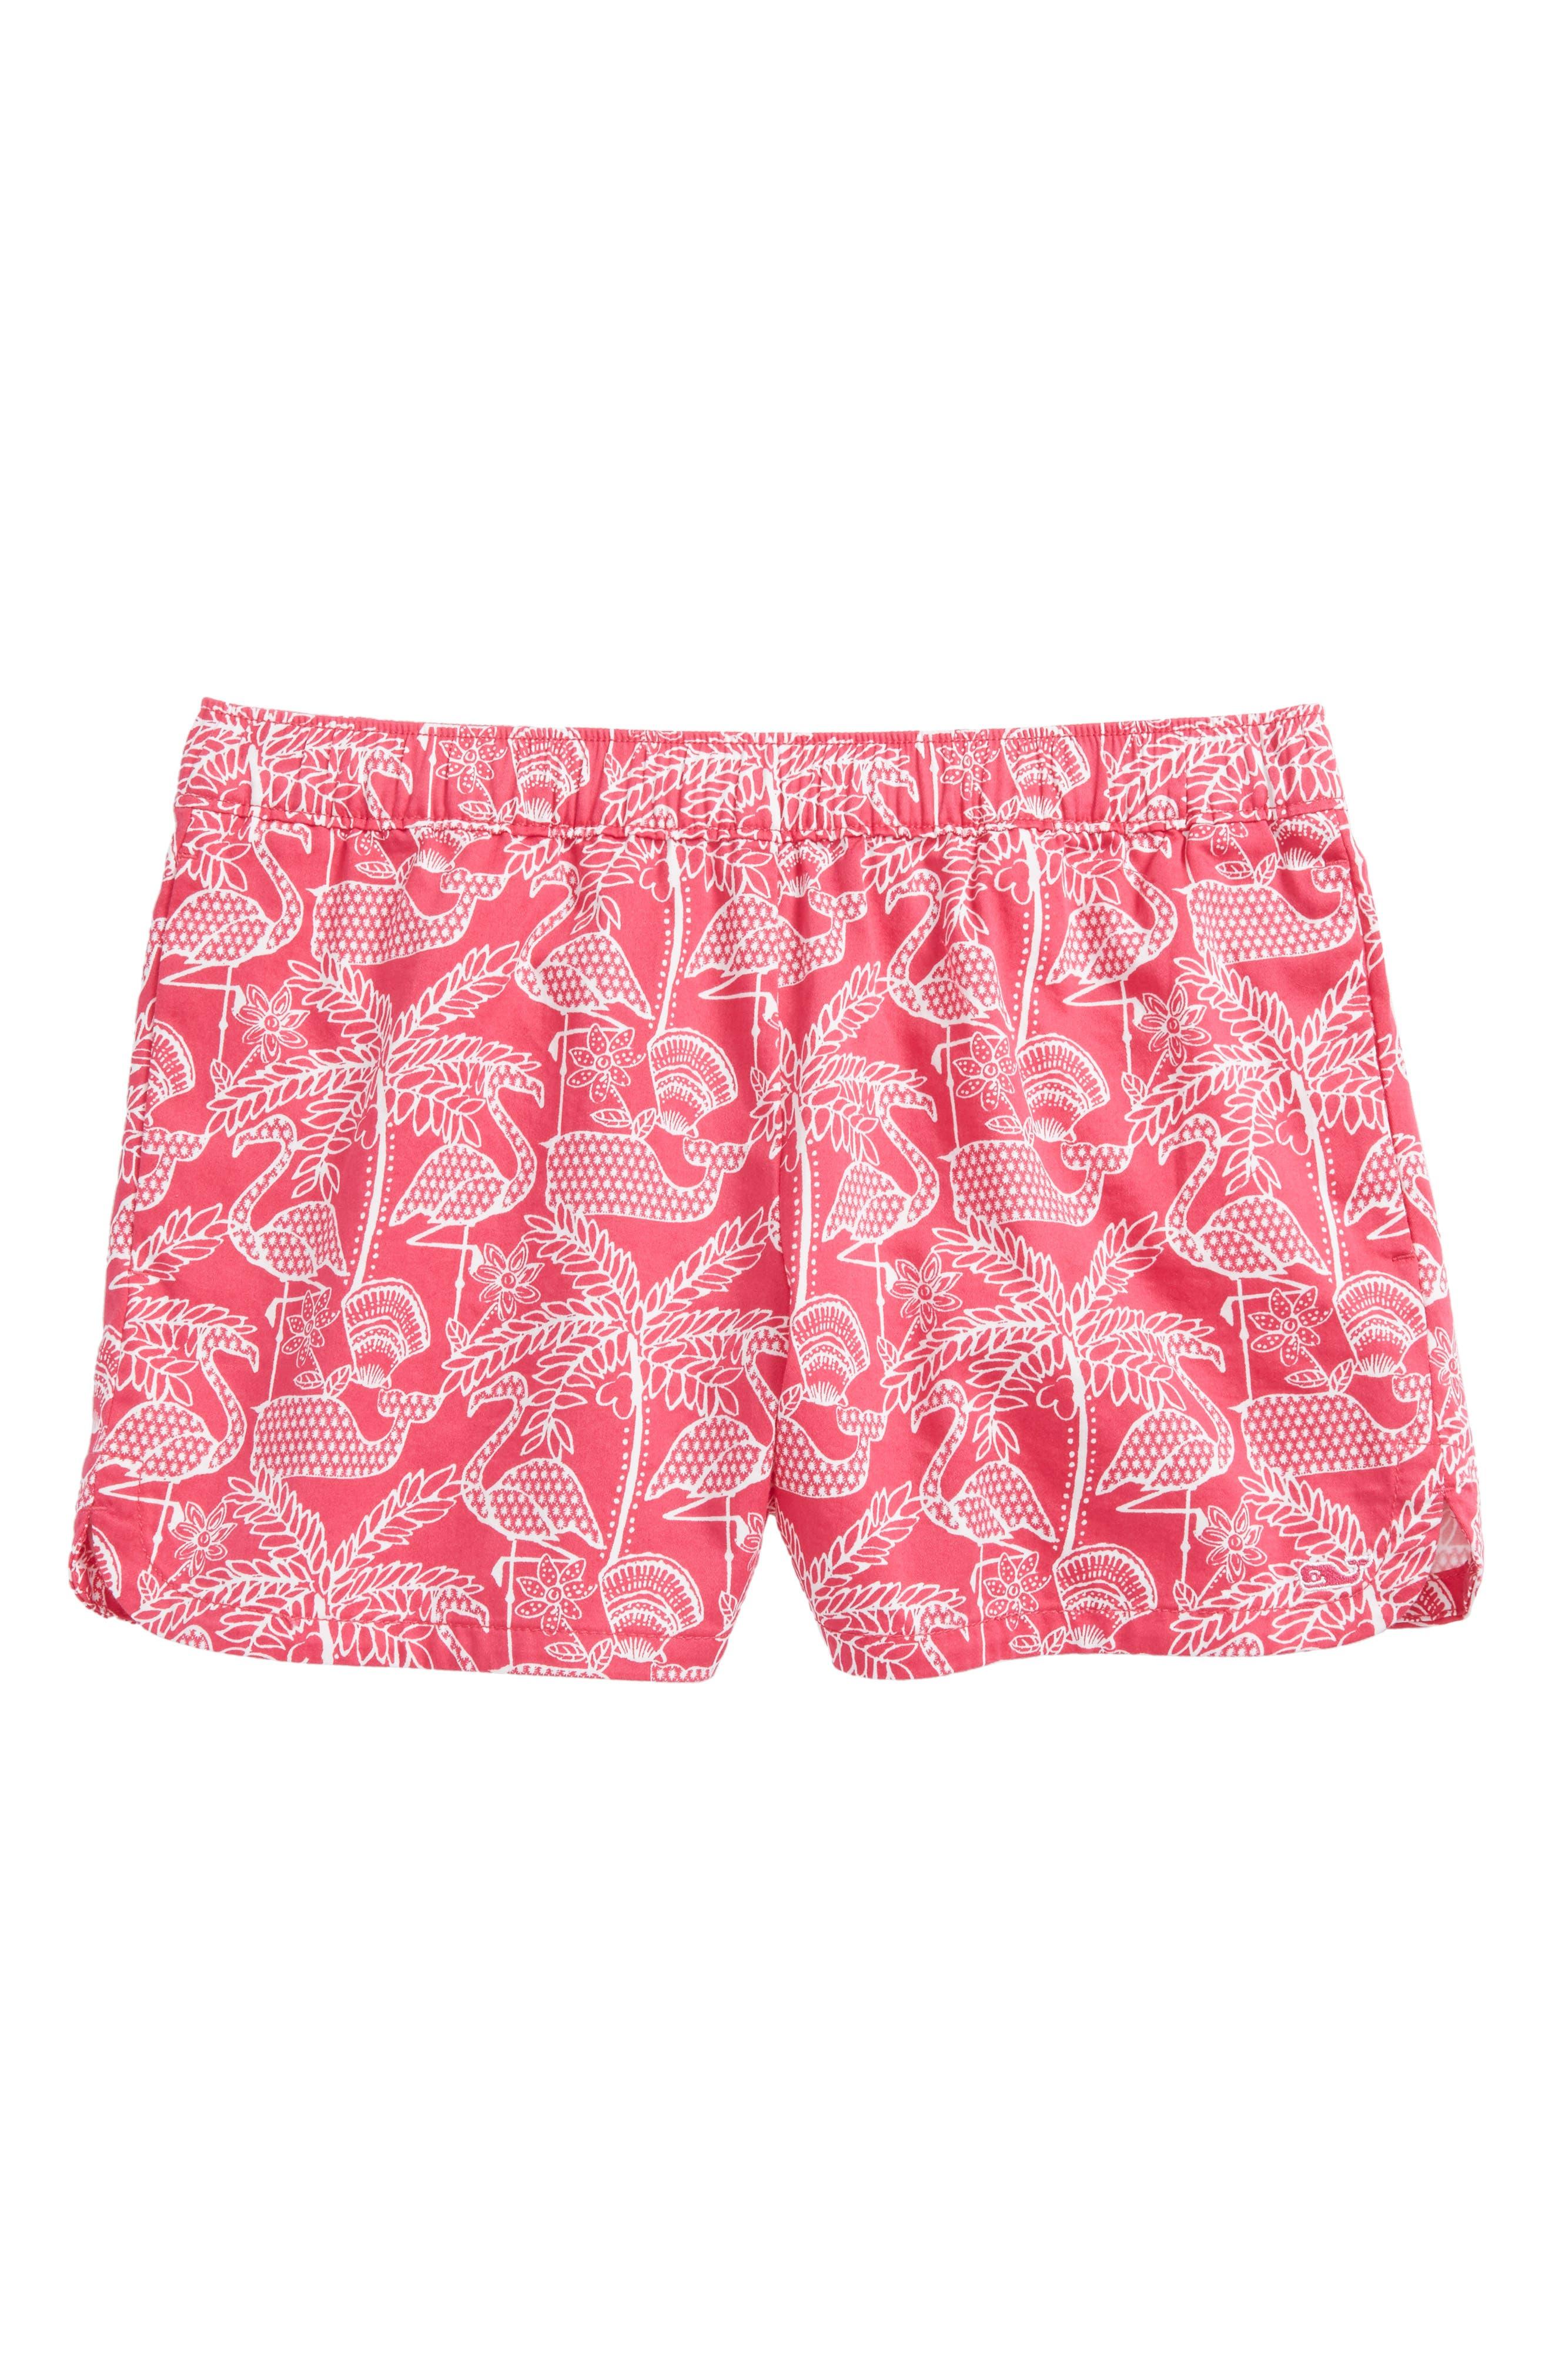 Flamingo Print Shorts,                         Main,                         color, Rhododendron